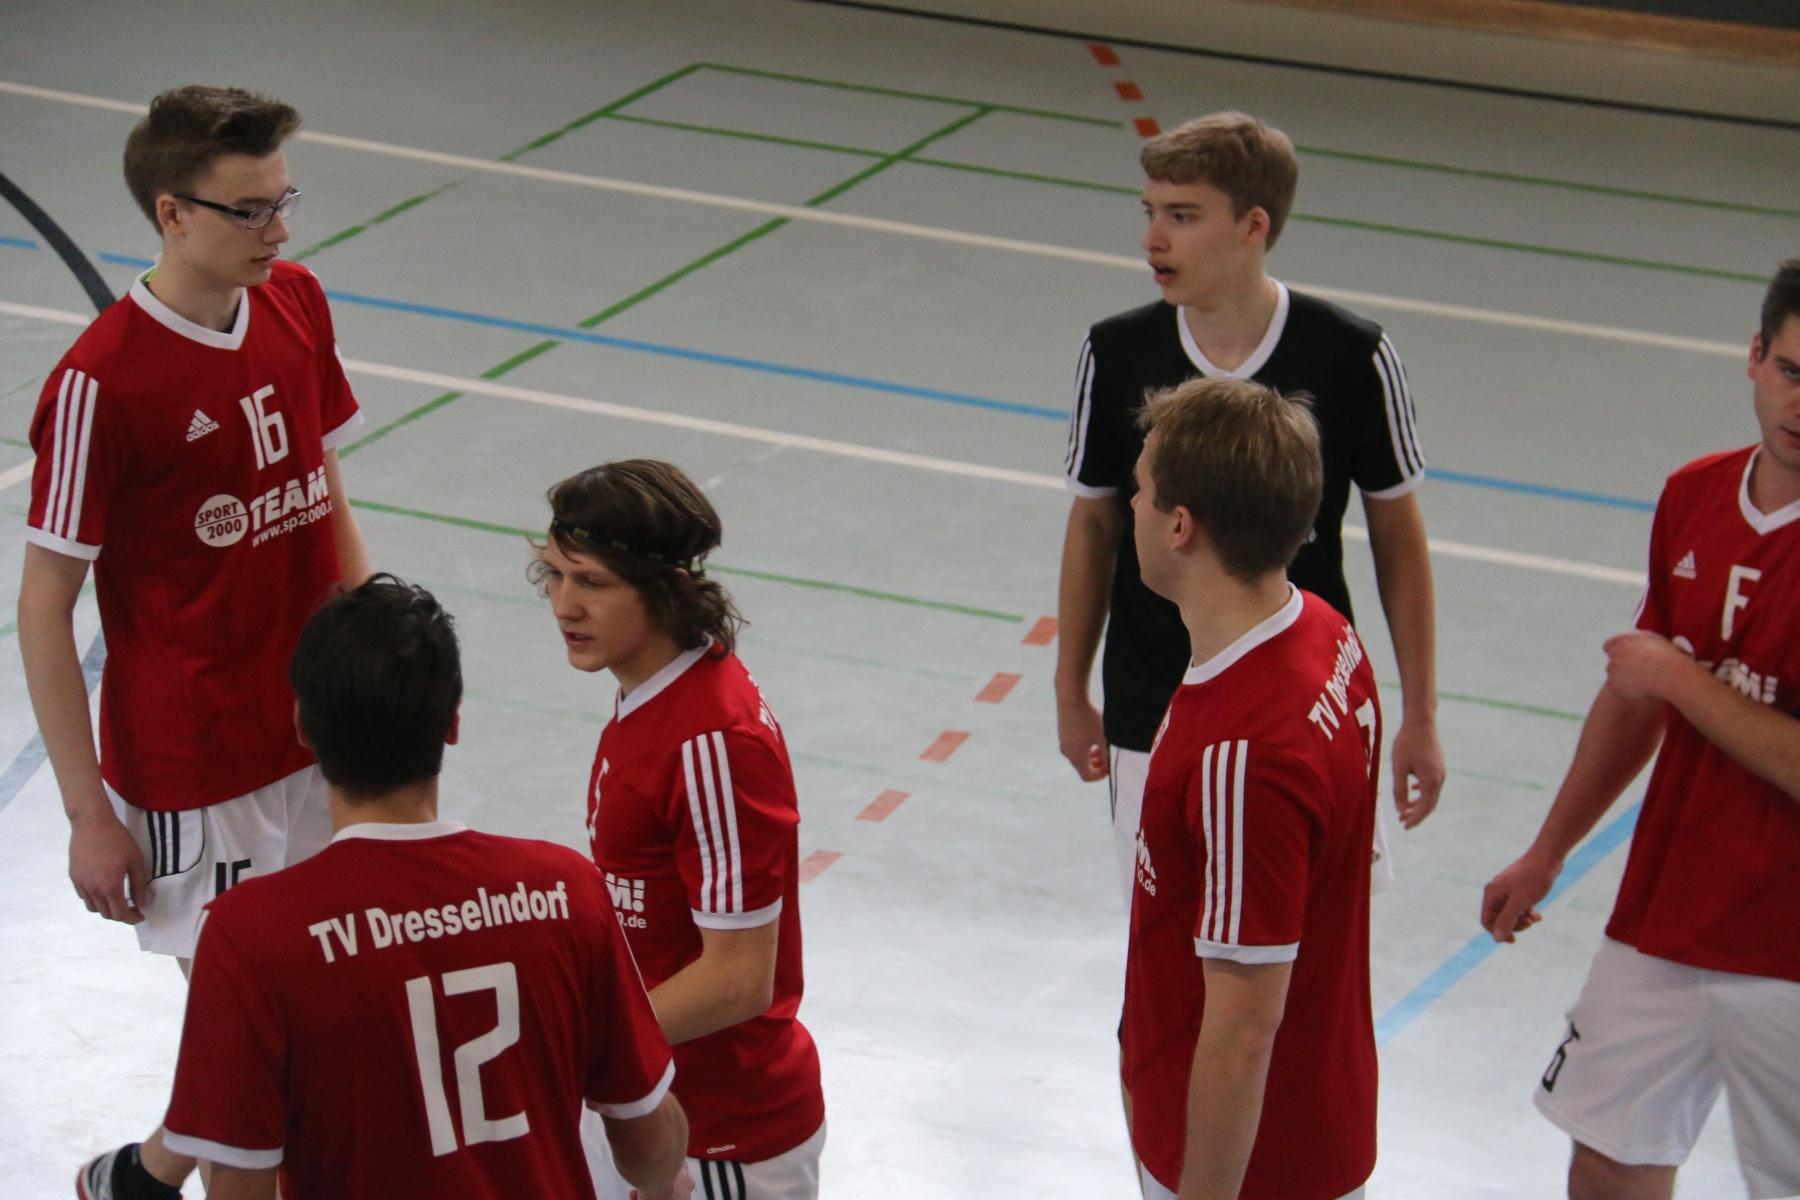 TVD-2-vs-Morsbach-008-33